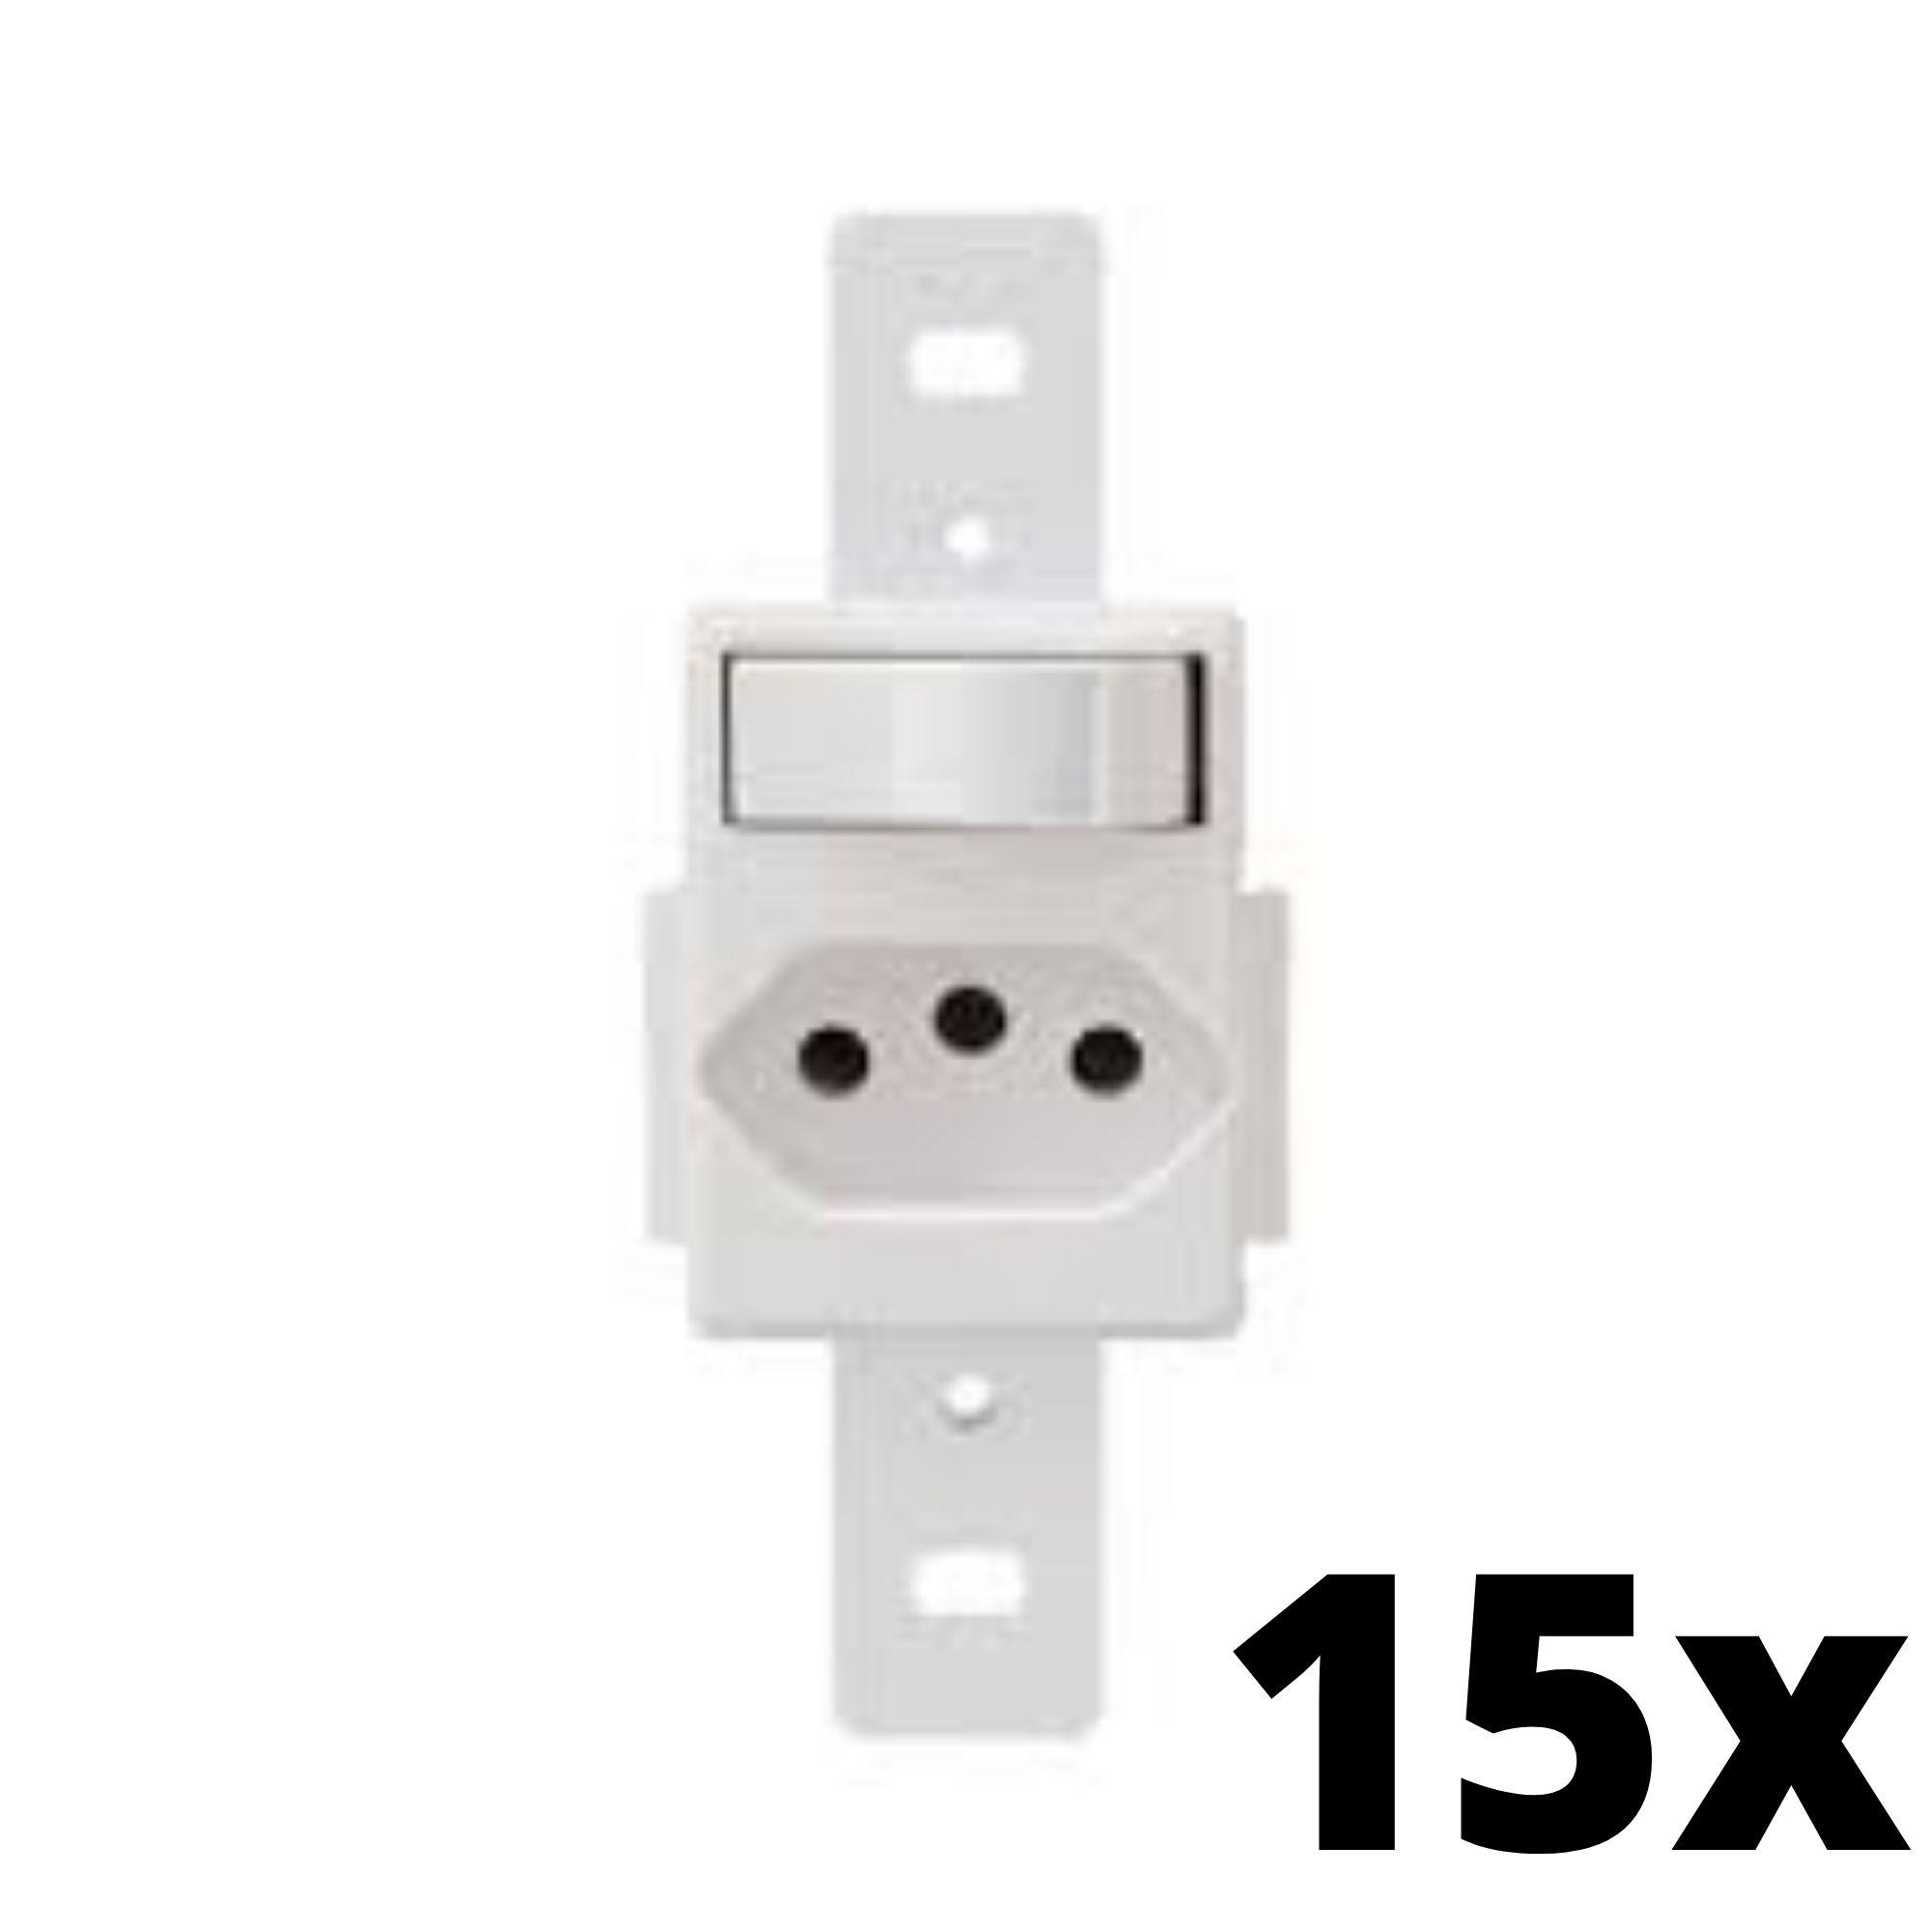 Kit 15 und Blanc 1Seção Interruptor Simples+1Seção Tomada 10A Sem Placa